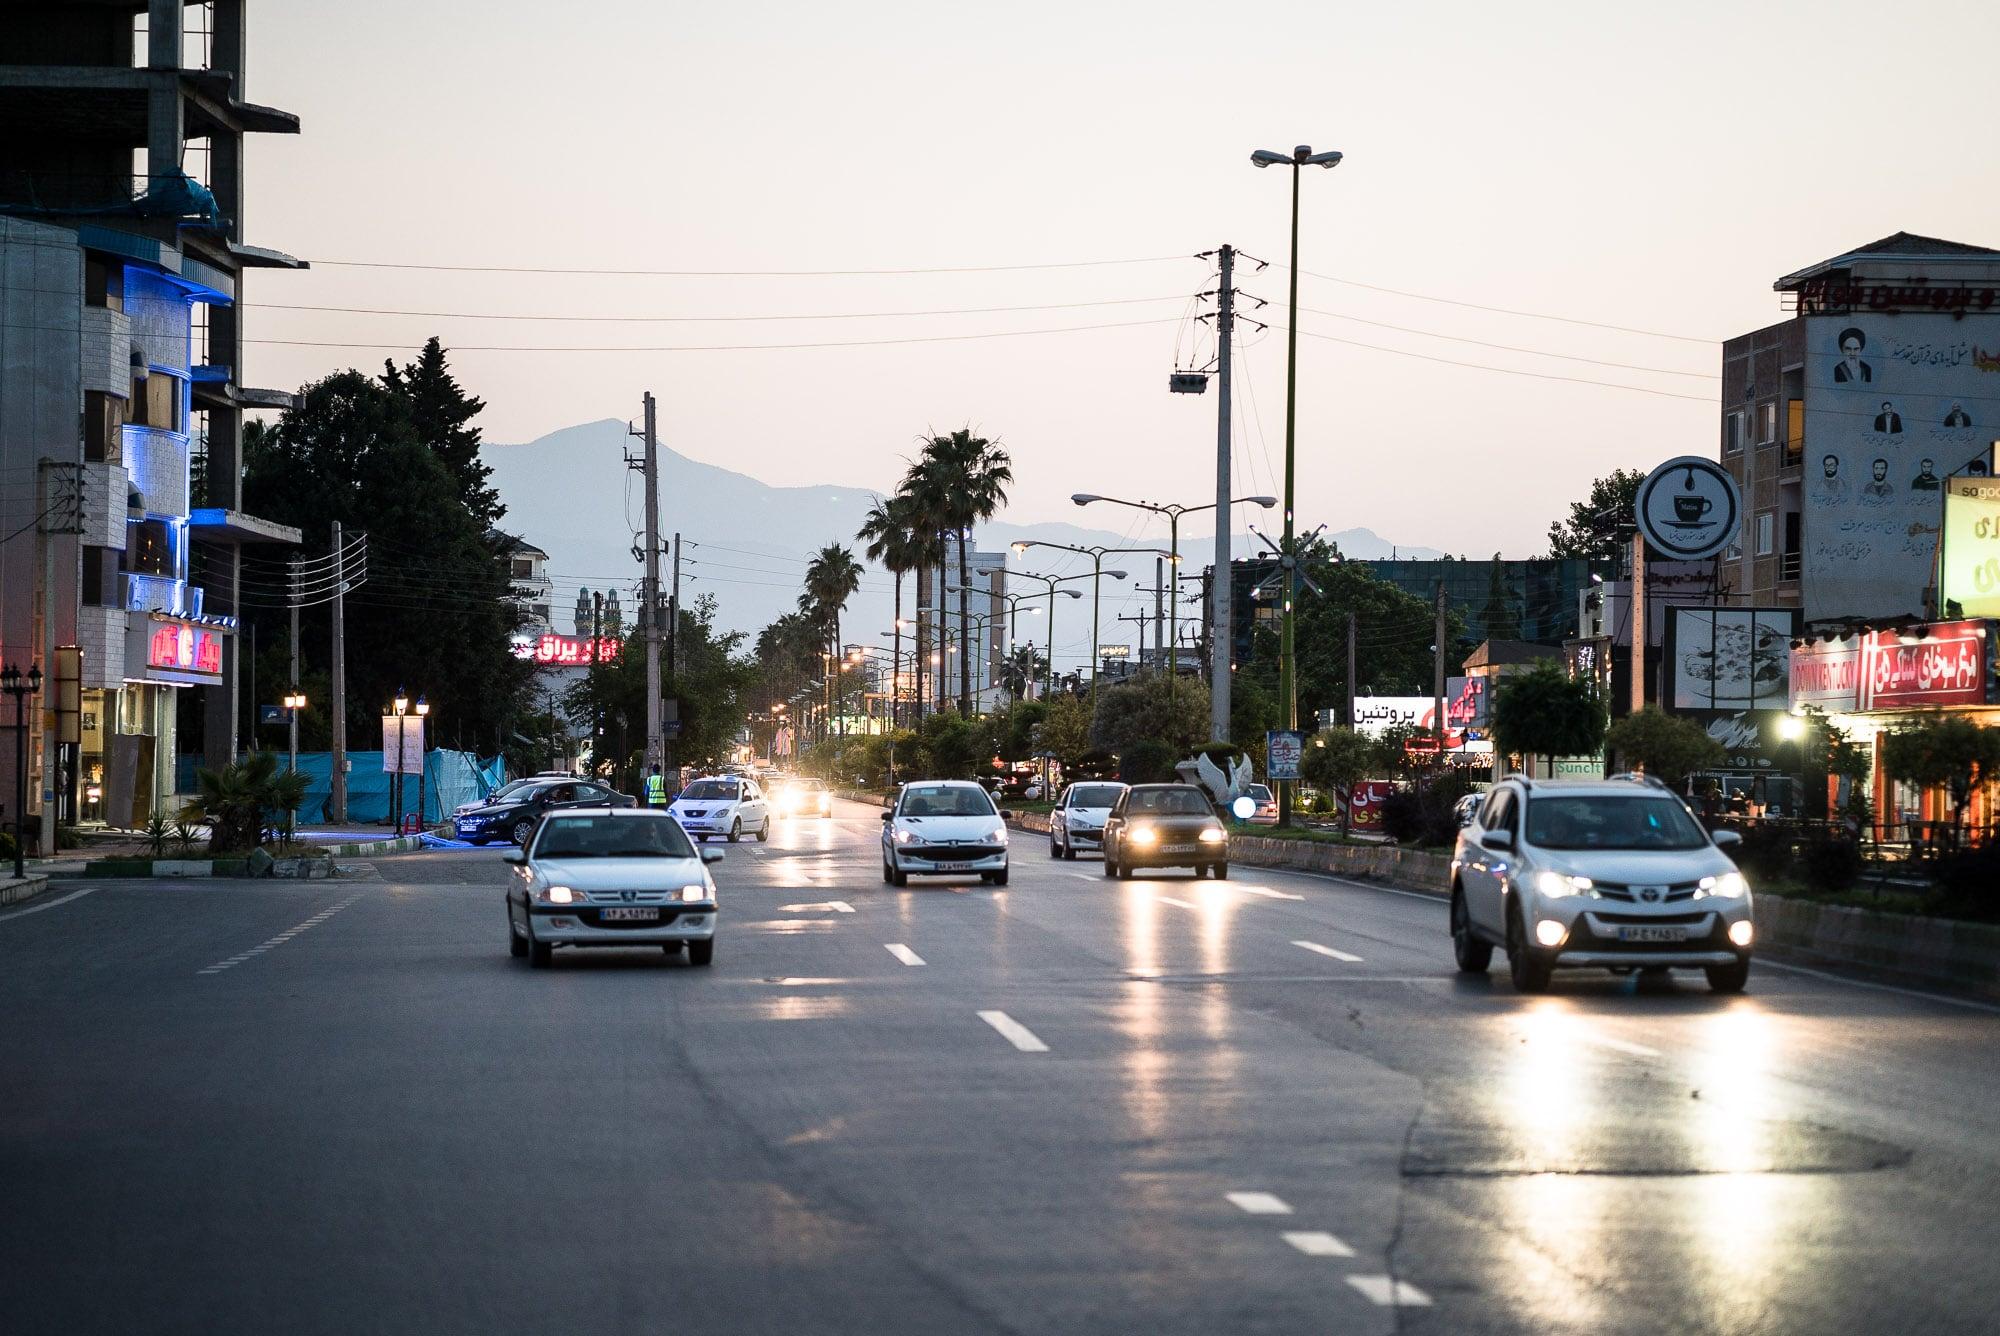 street scene in Nur